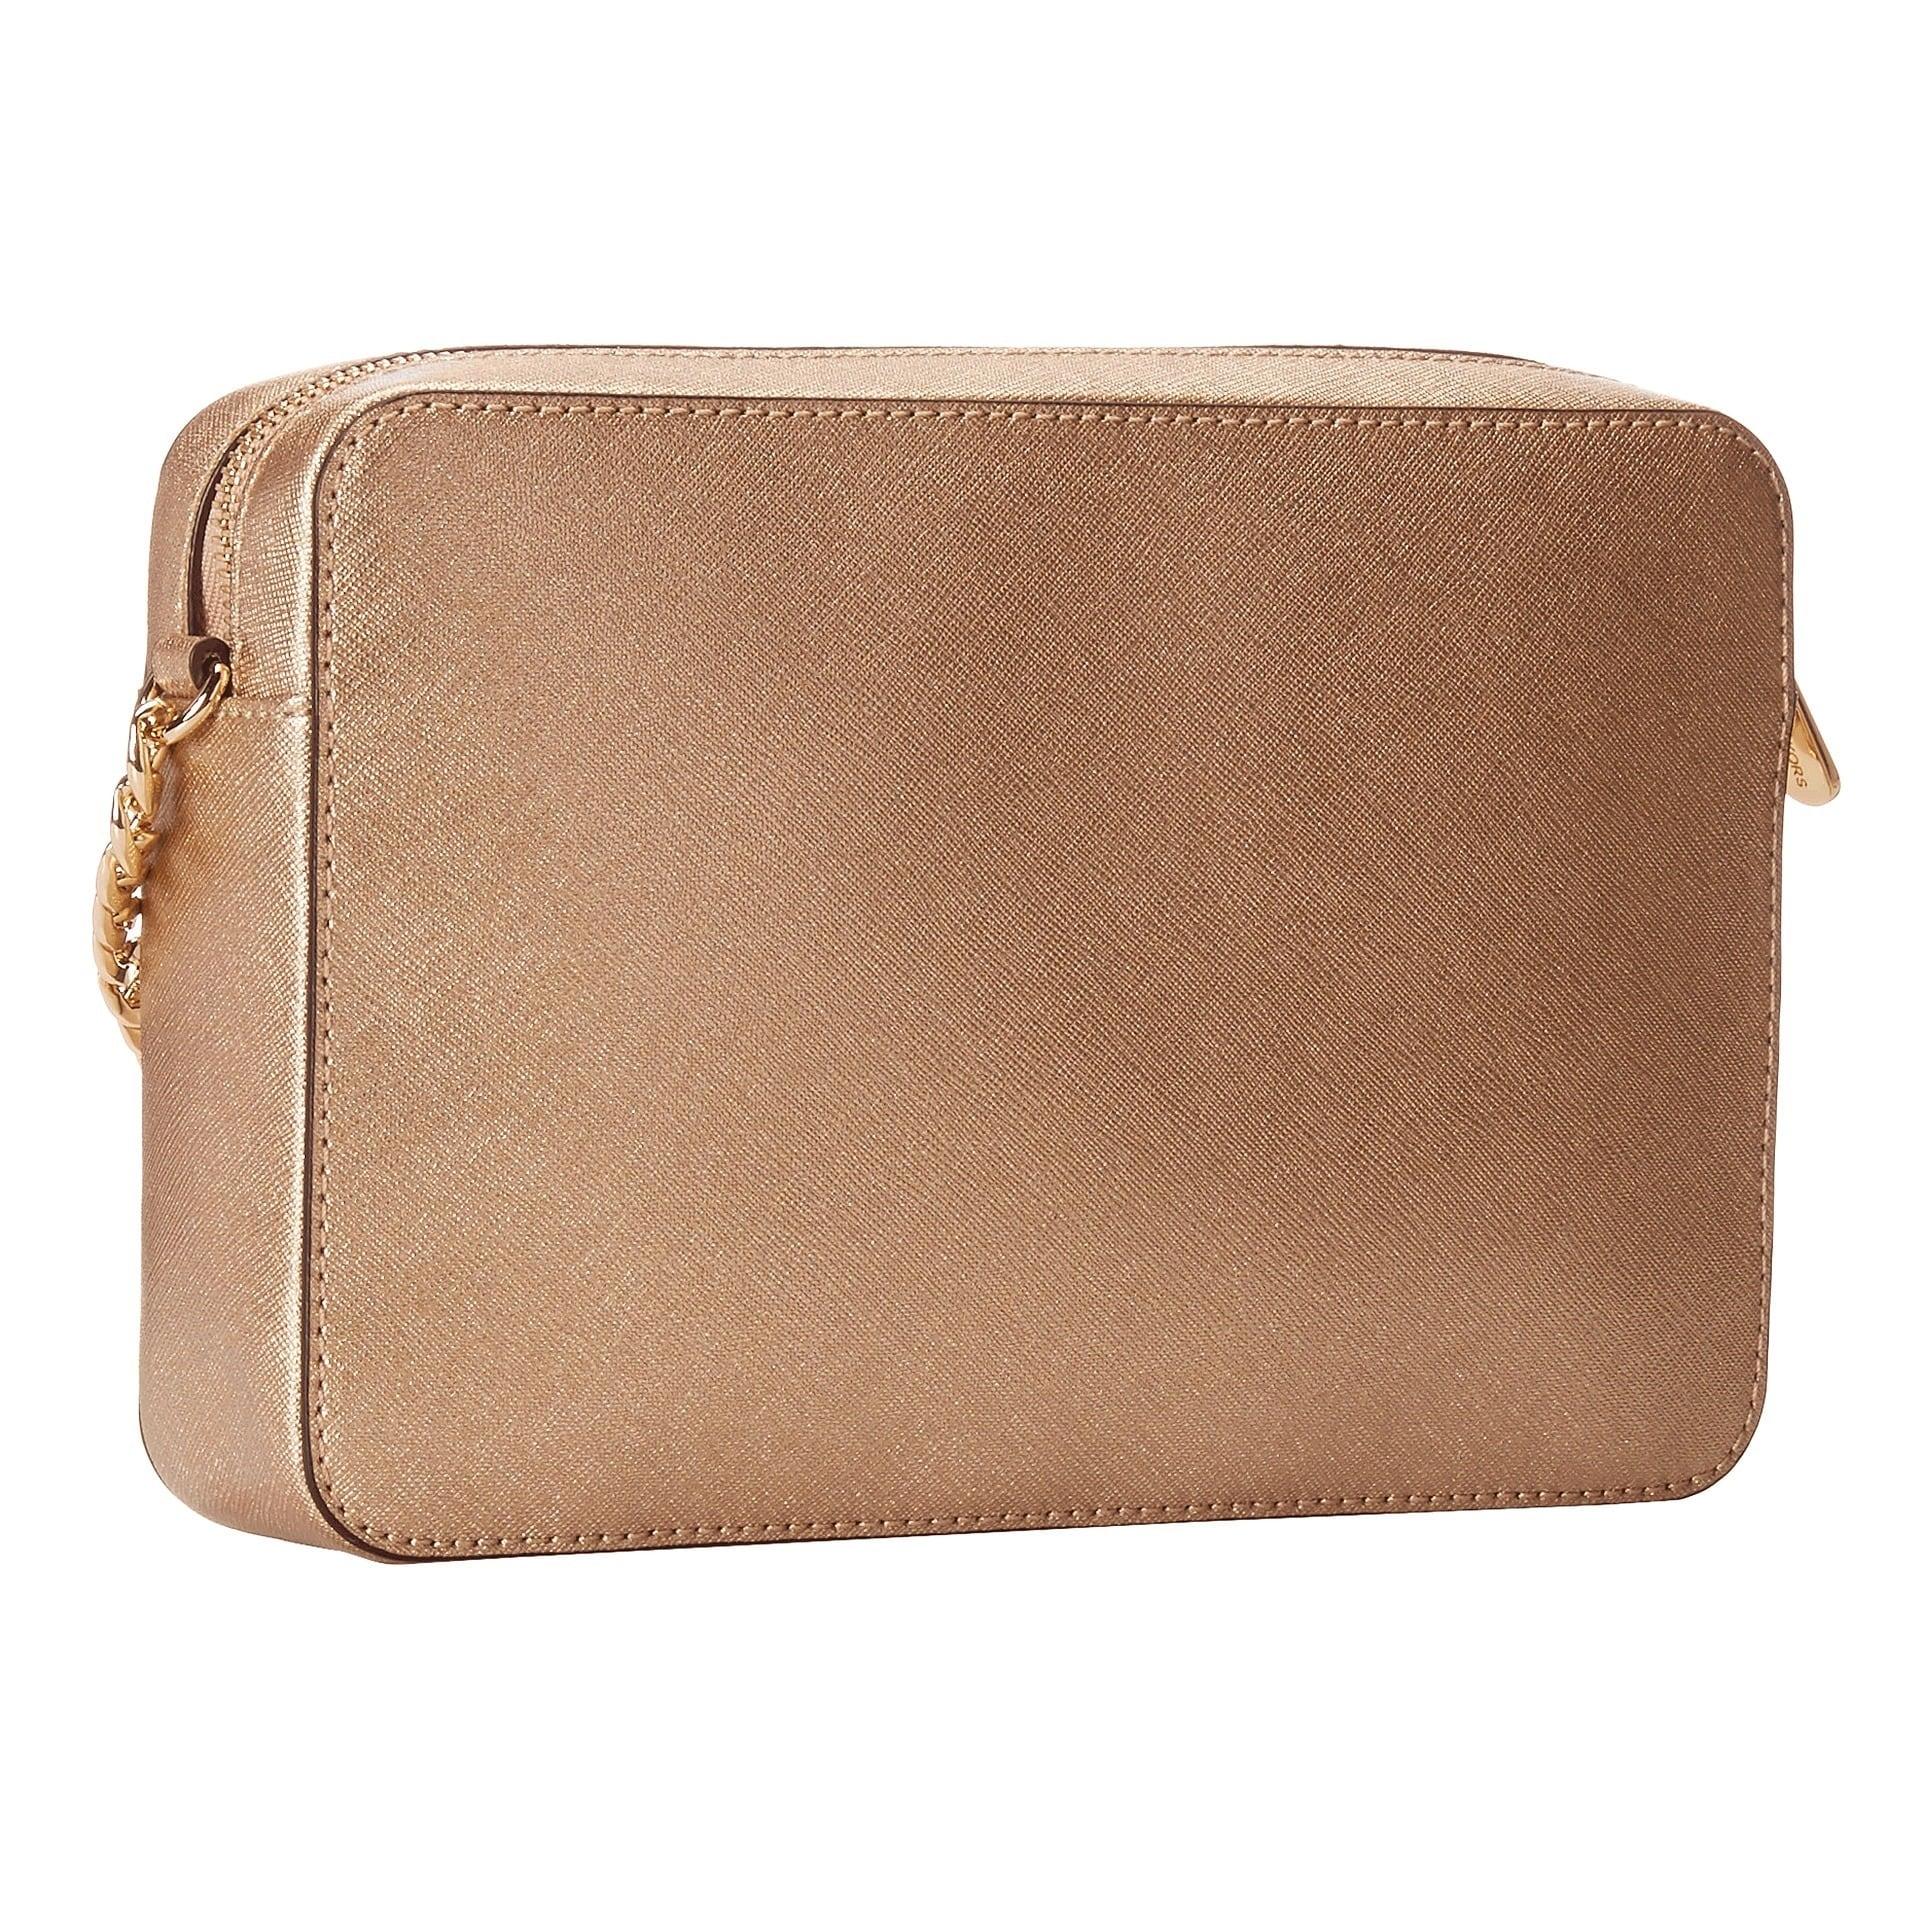 fedb26f3041f Shop Michael Kors Jet Set Pale Gold Travel Large Crossbody Handbag - Free  Shipping Today - Overstock - 11650437